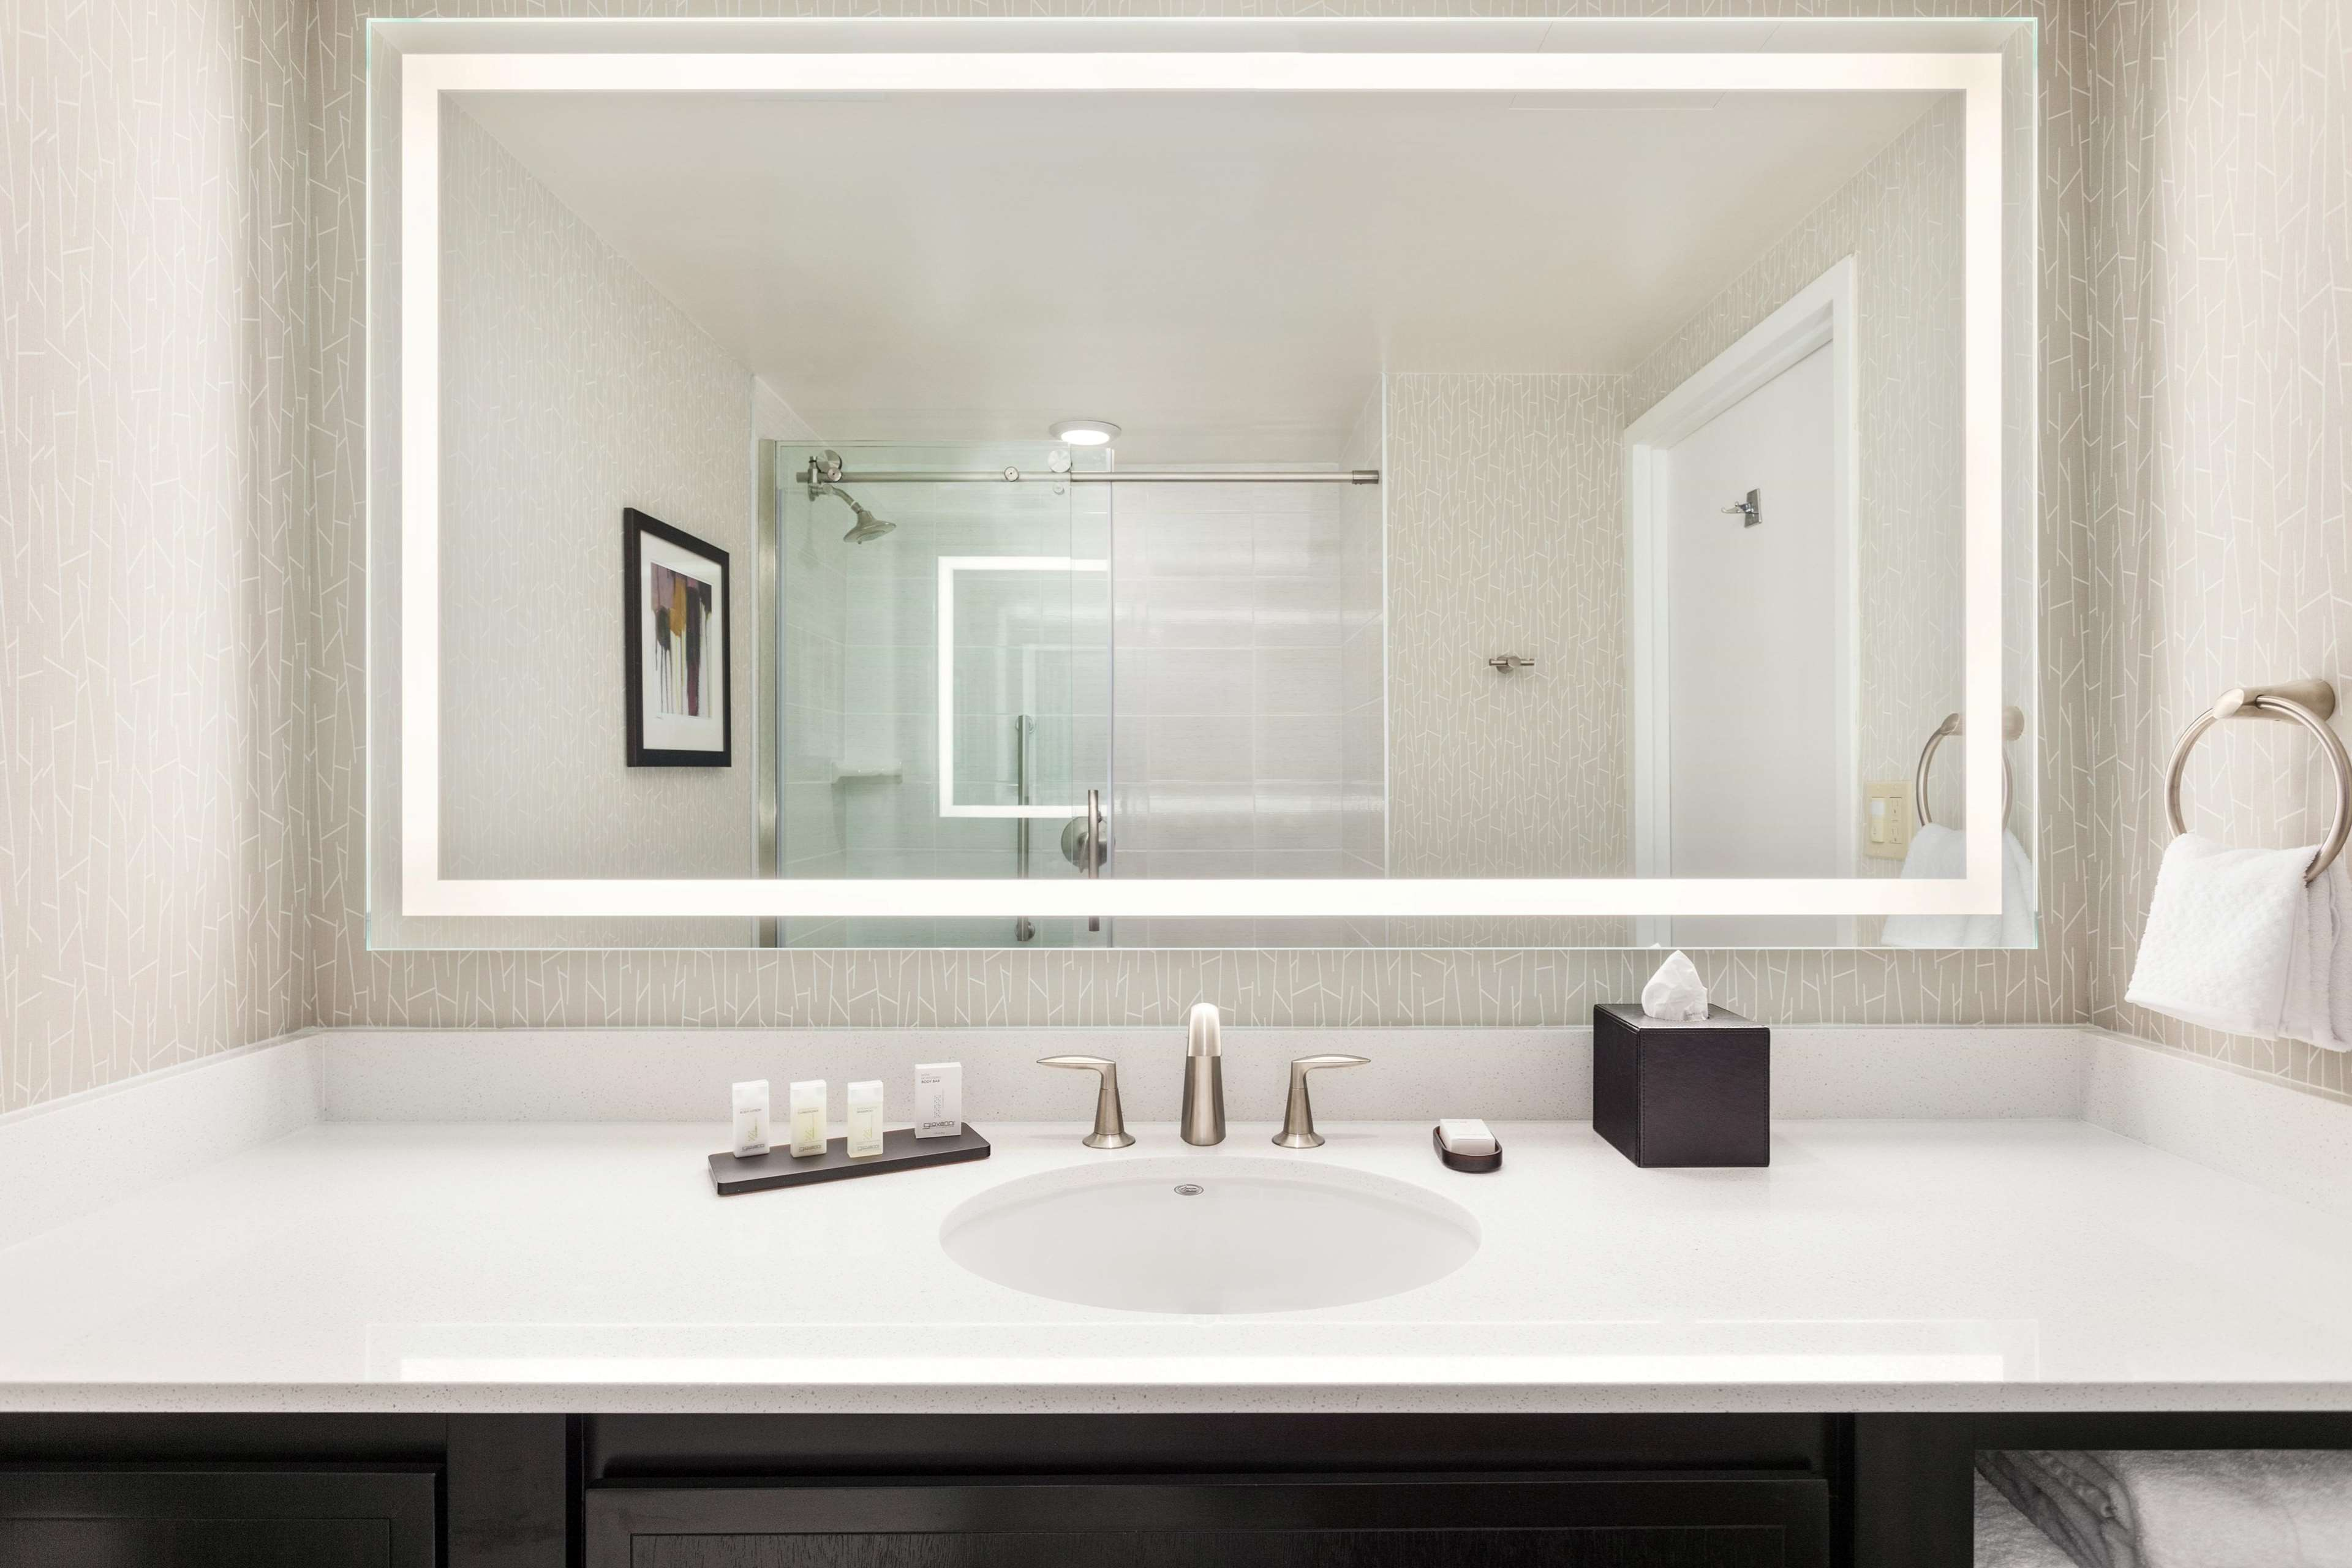 King City View Bathroom